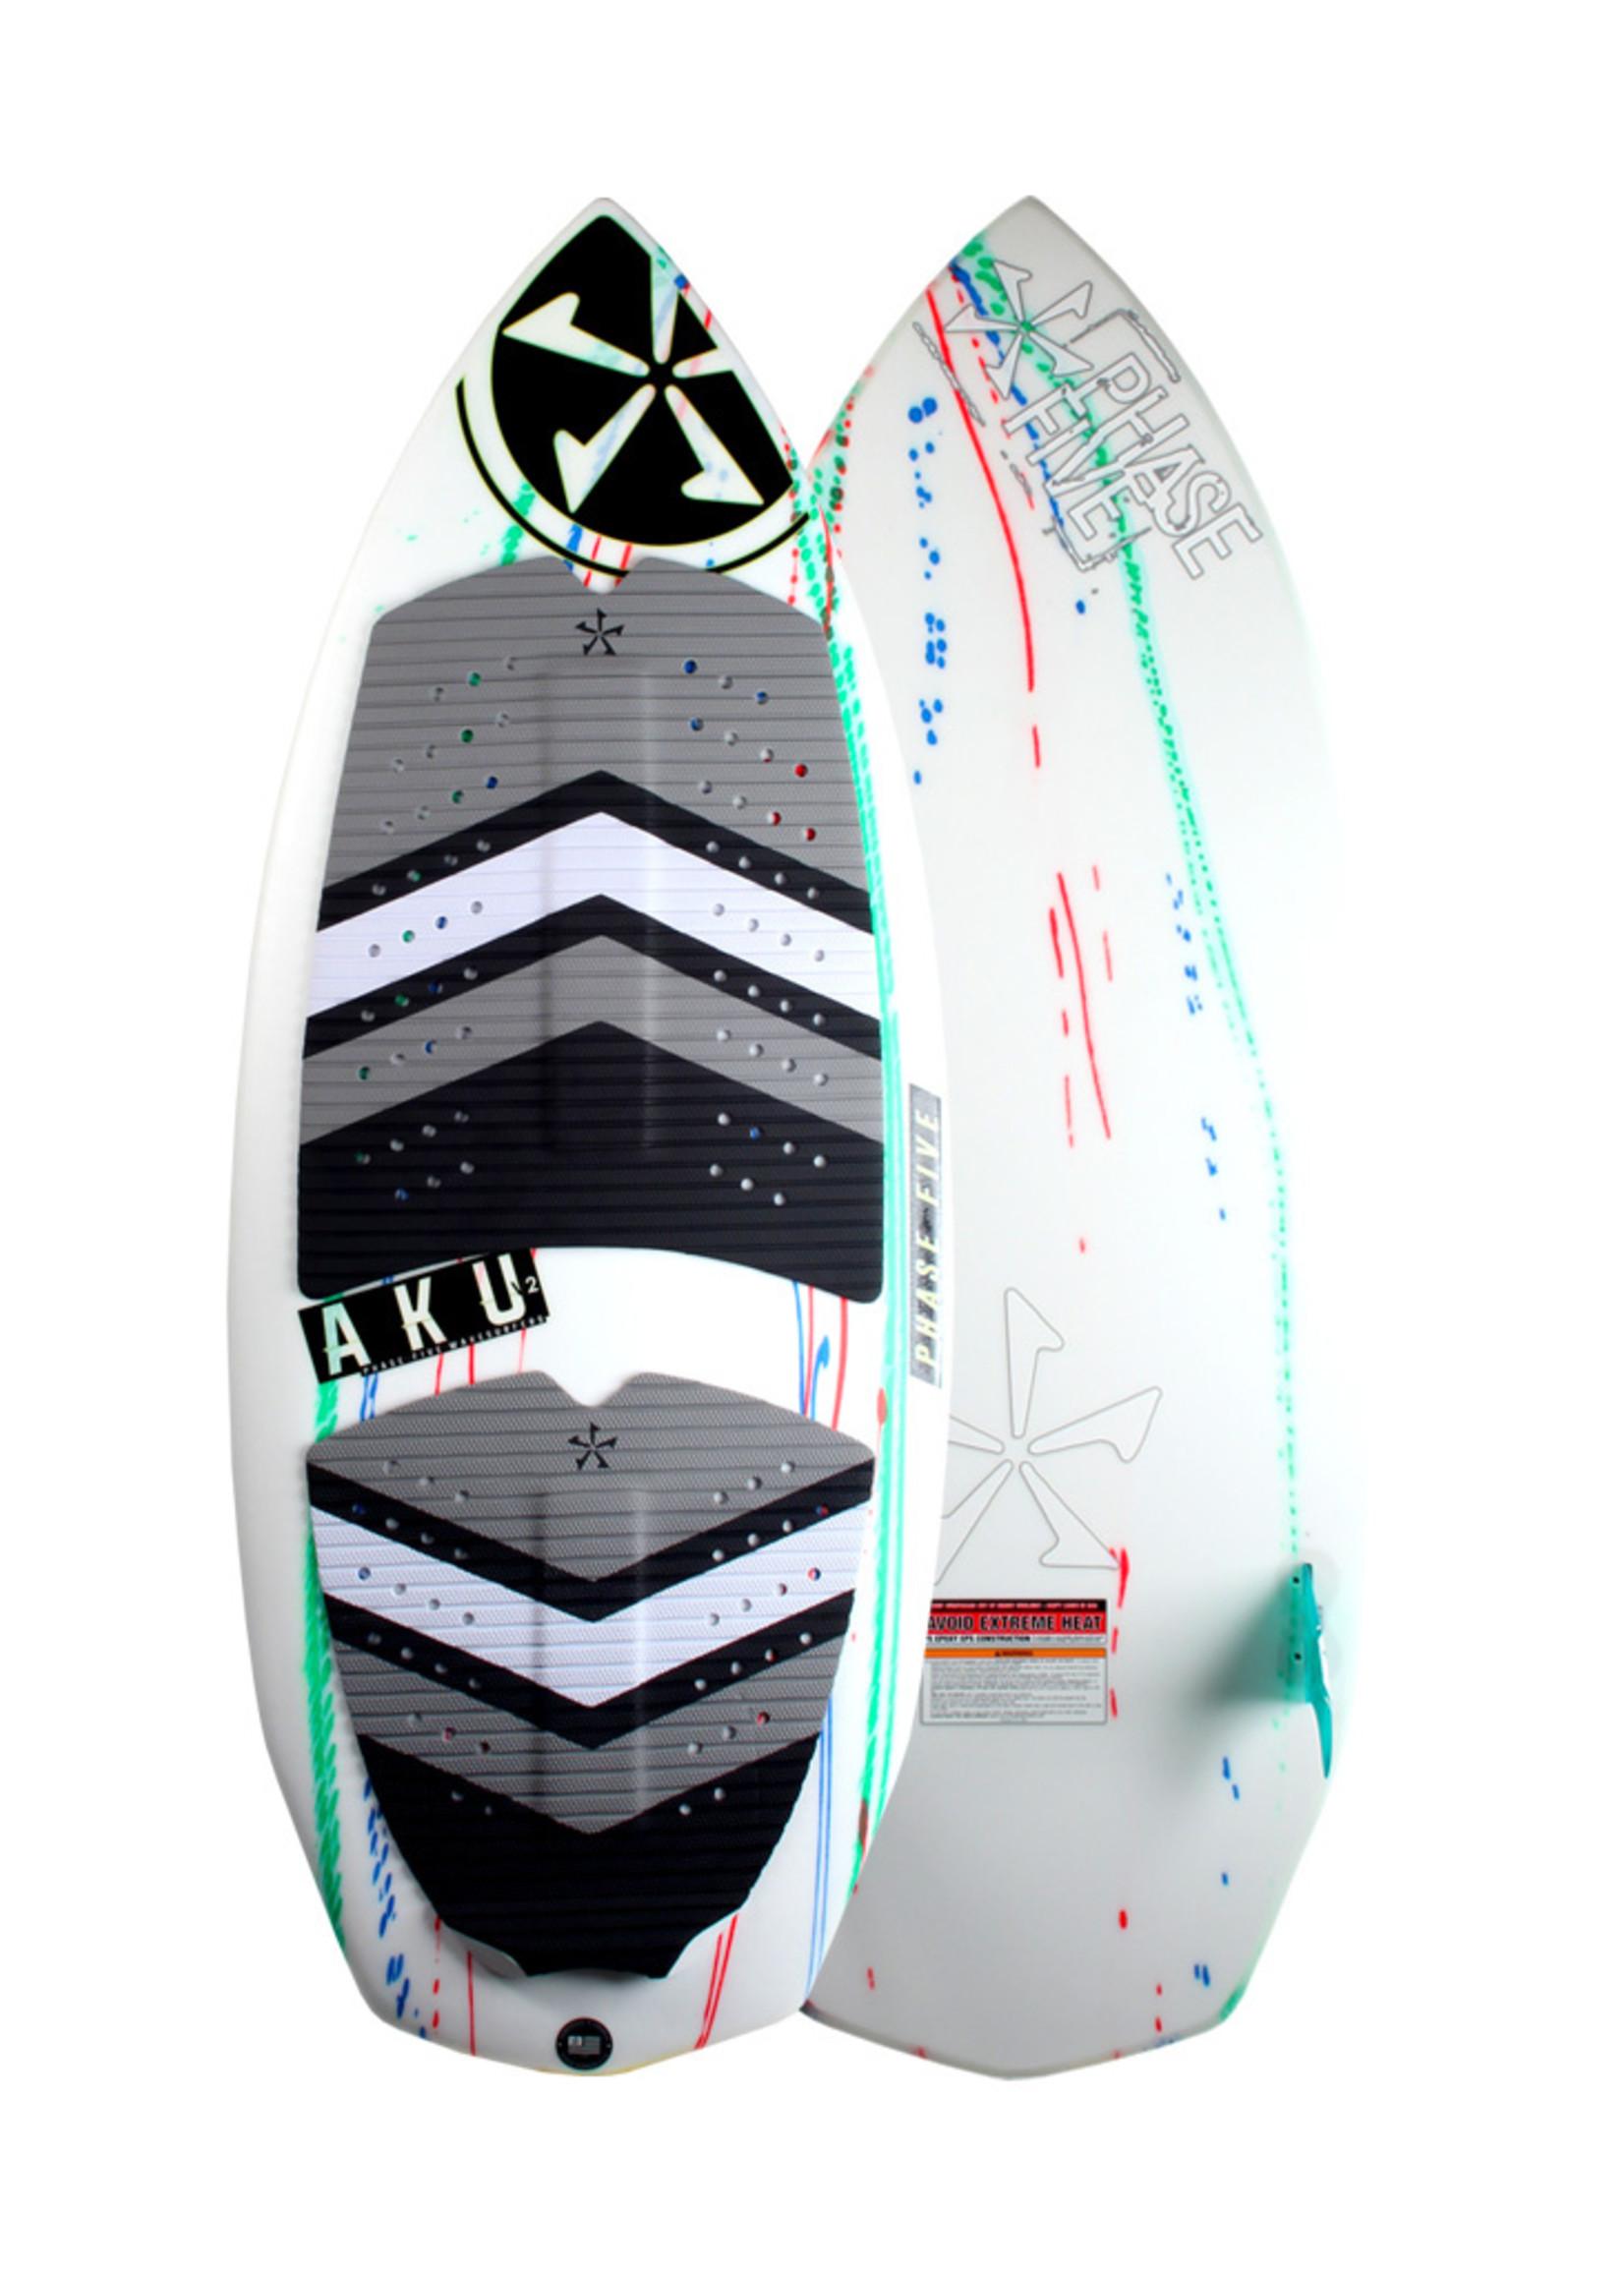 "Phase Five Phase Five Aku V2 58"" Surf-Style Wakesurf"